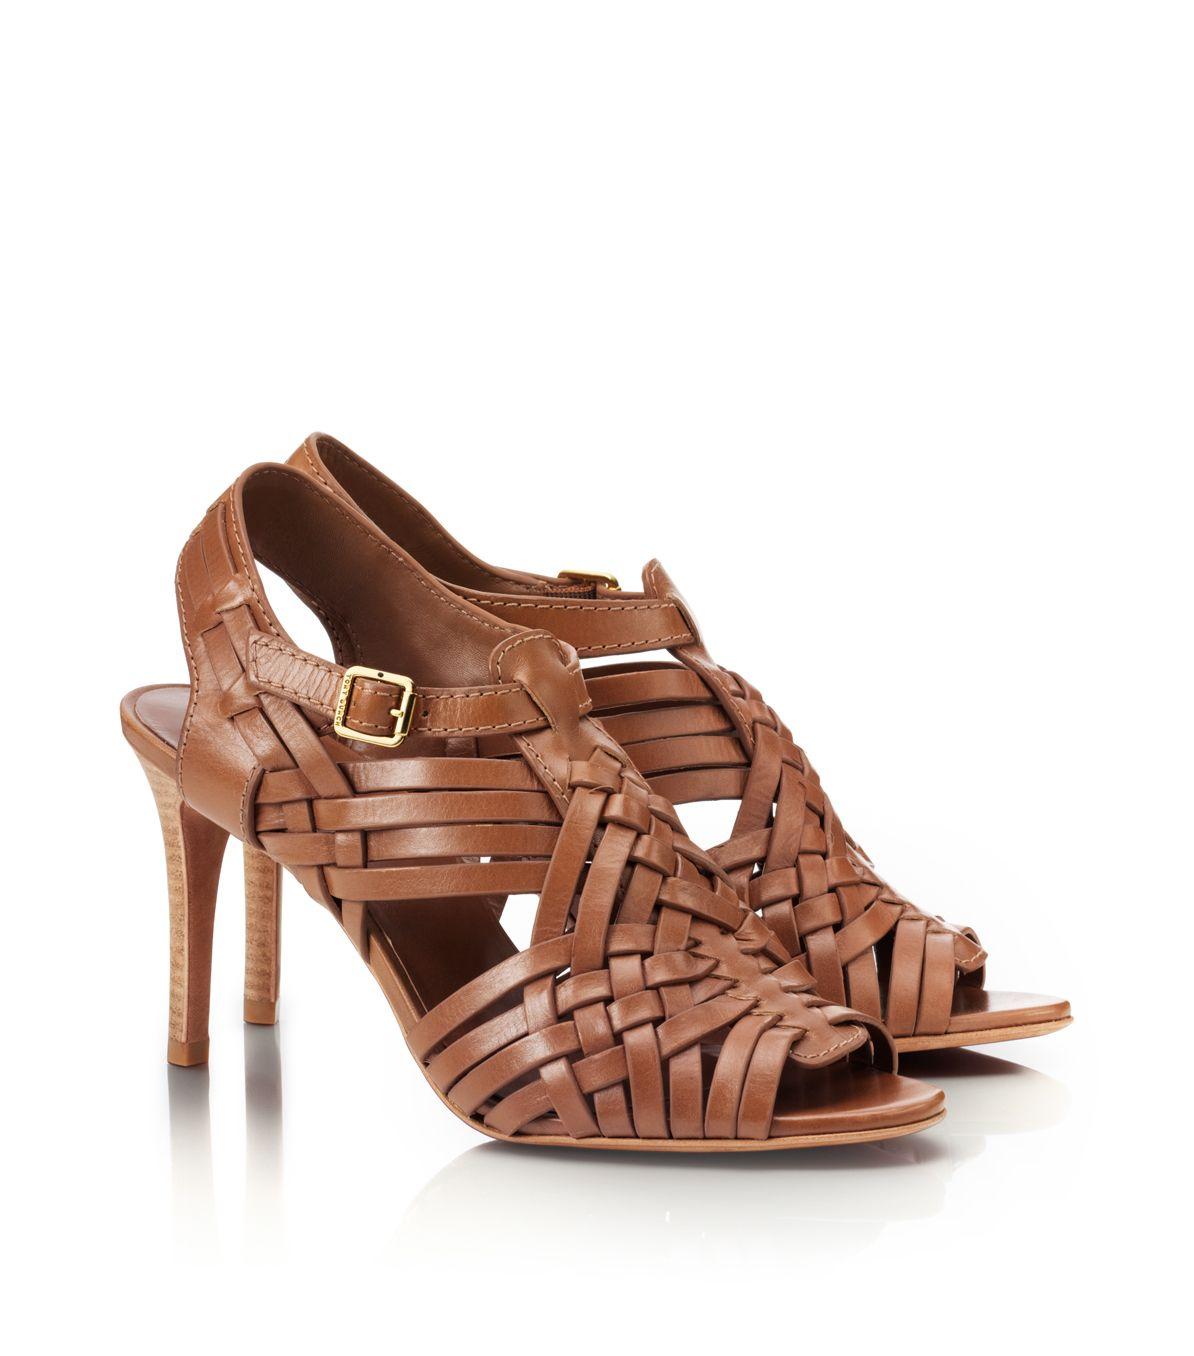 895f1c6cf3b8 Lyst - Tory Burch Nadia Mid Heel Sandal in Brown